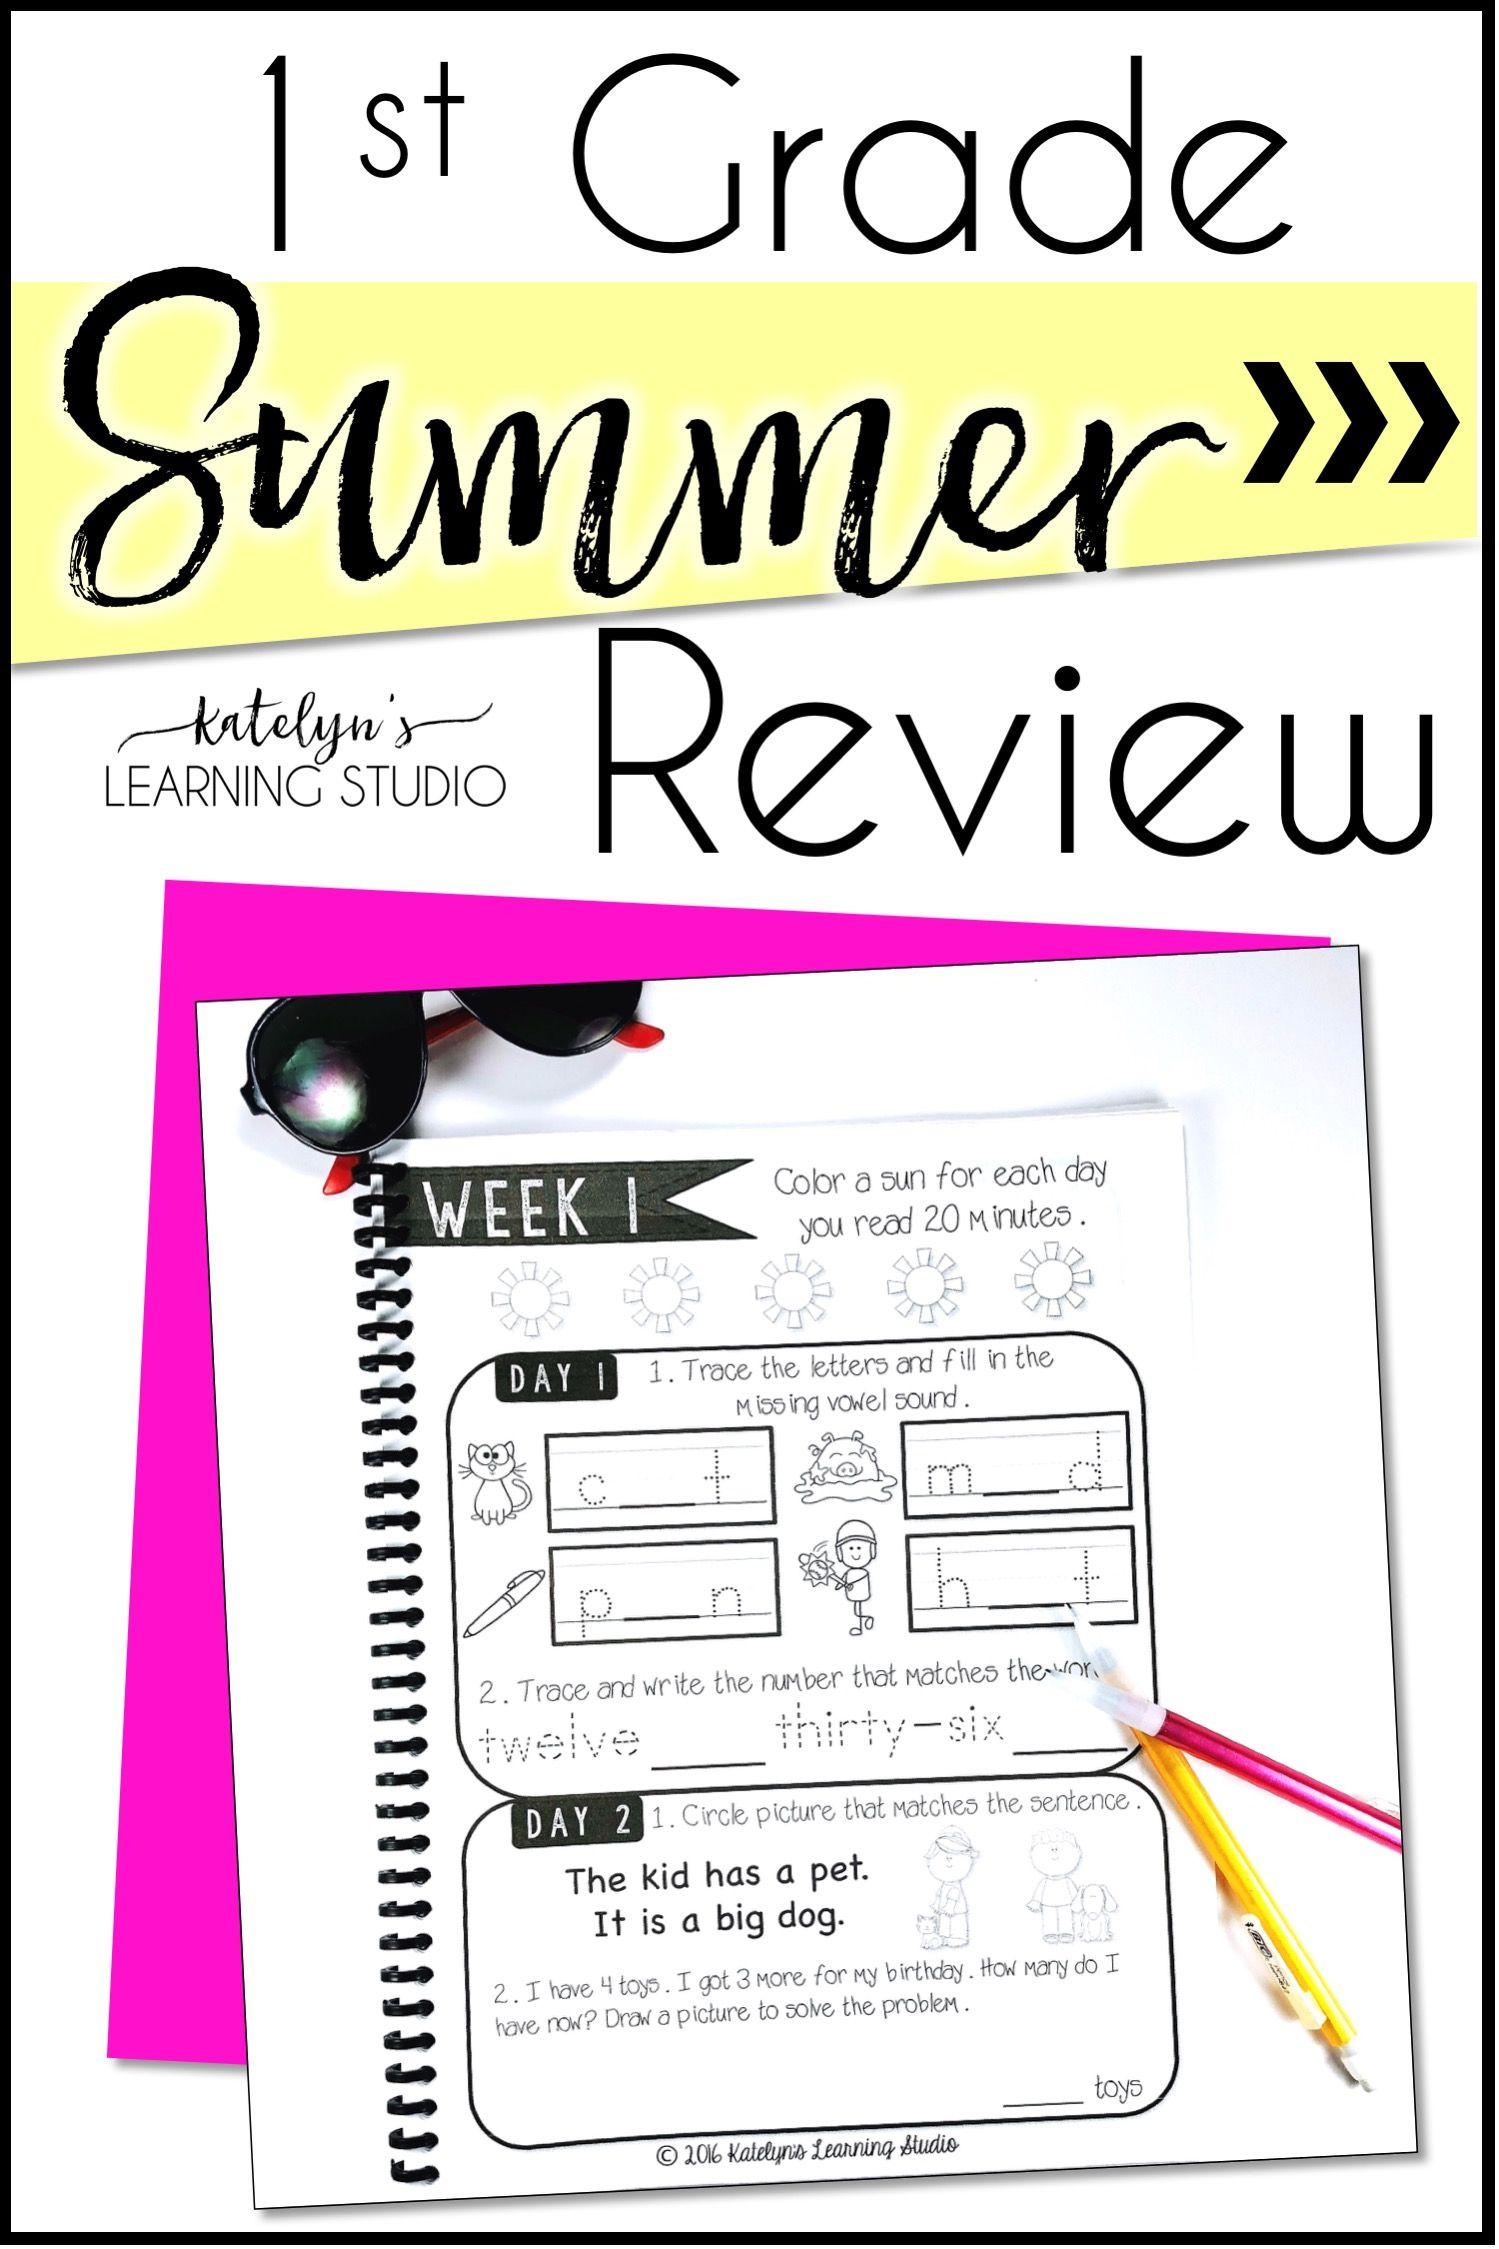 1st Grade Summer Review Packet